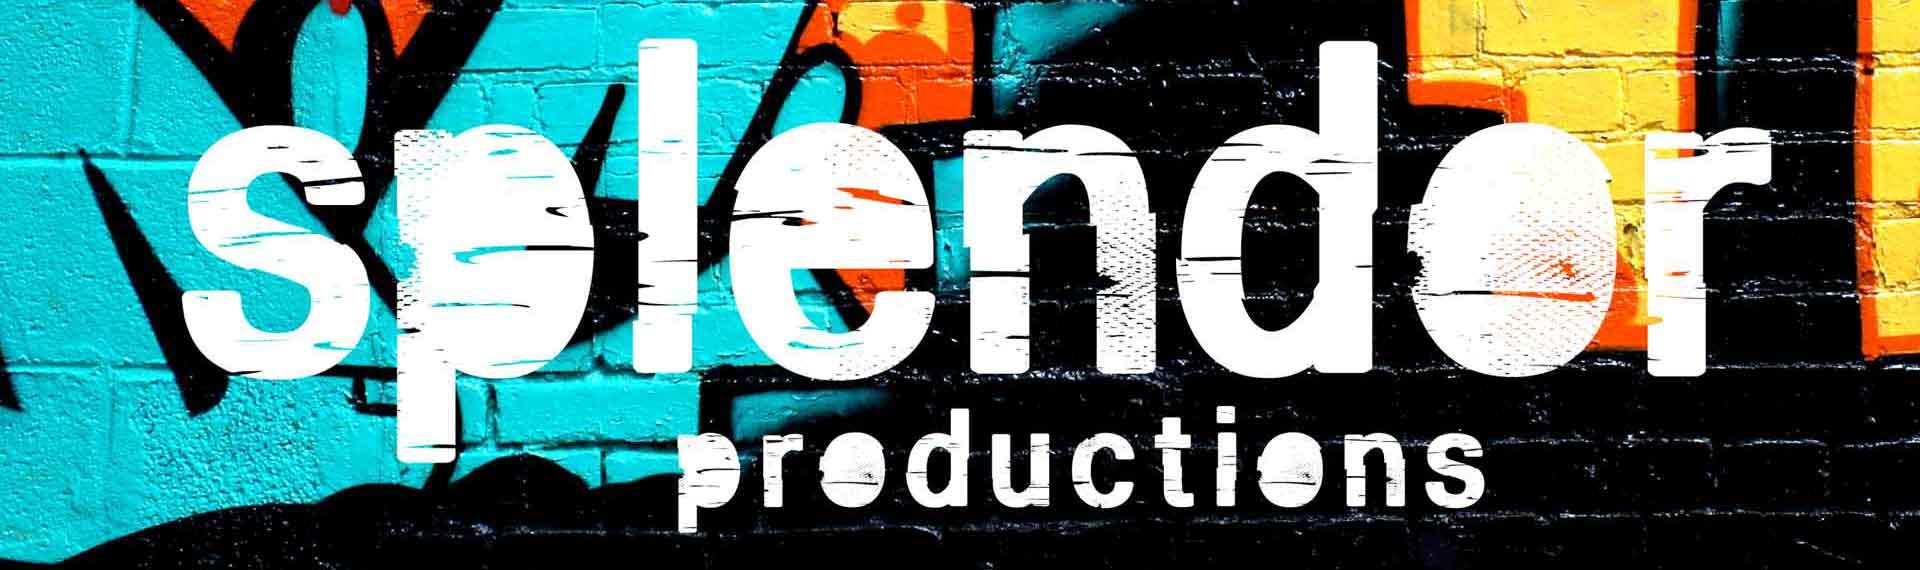 Splendor Productions